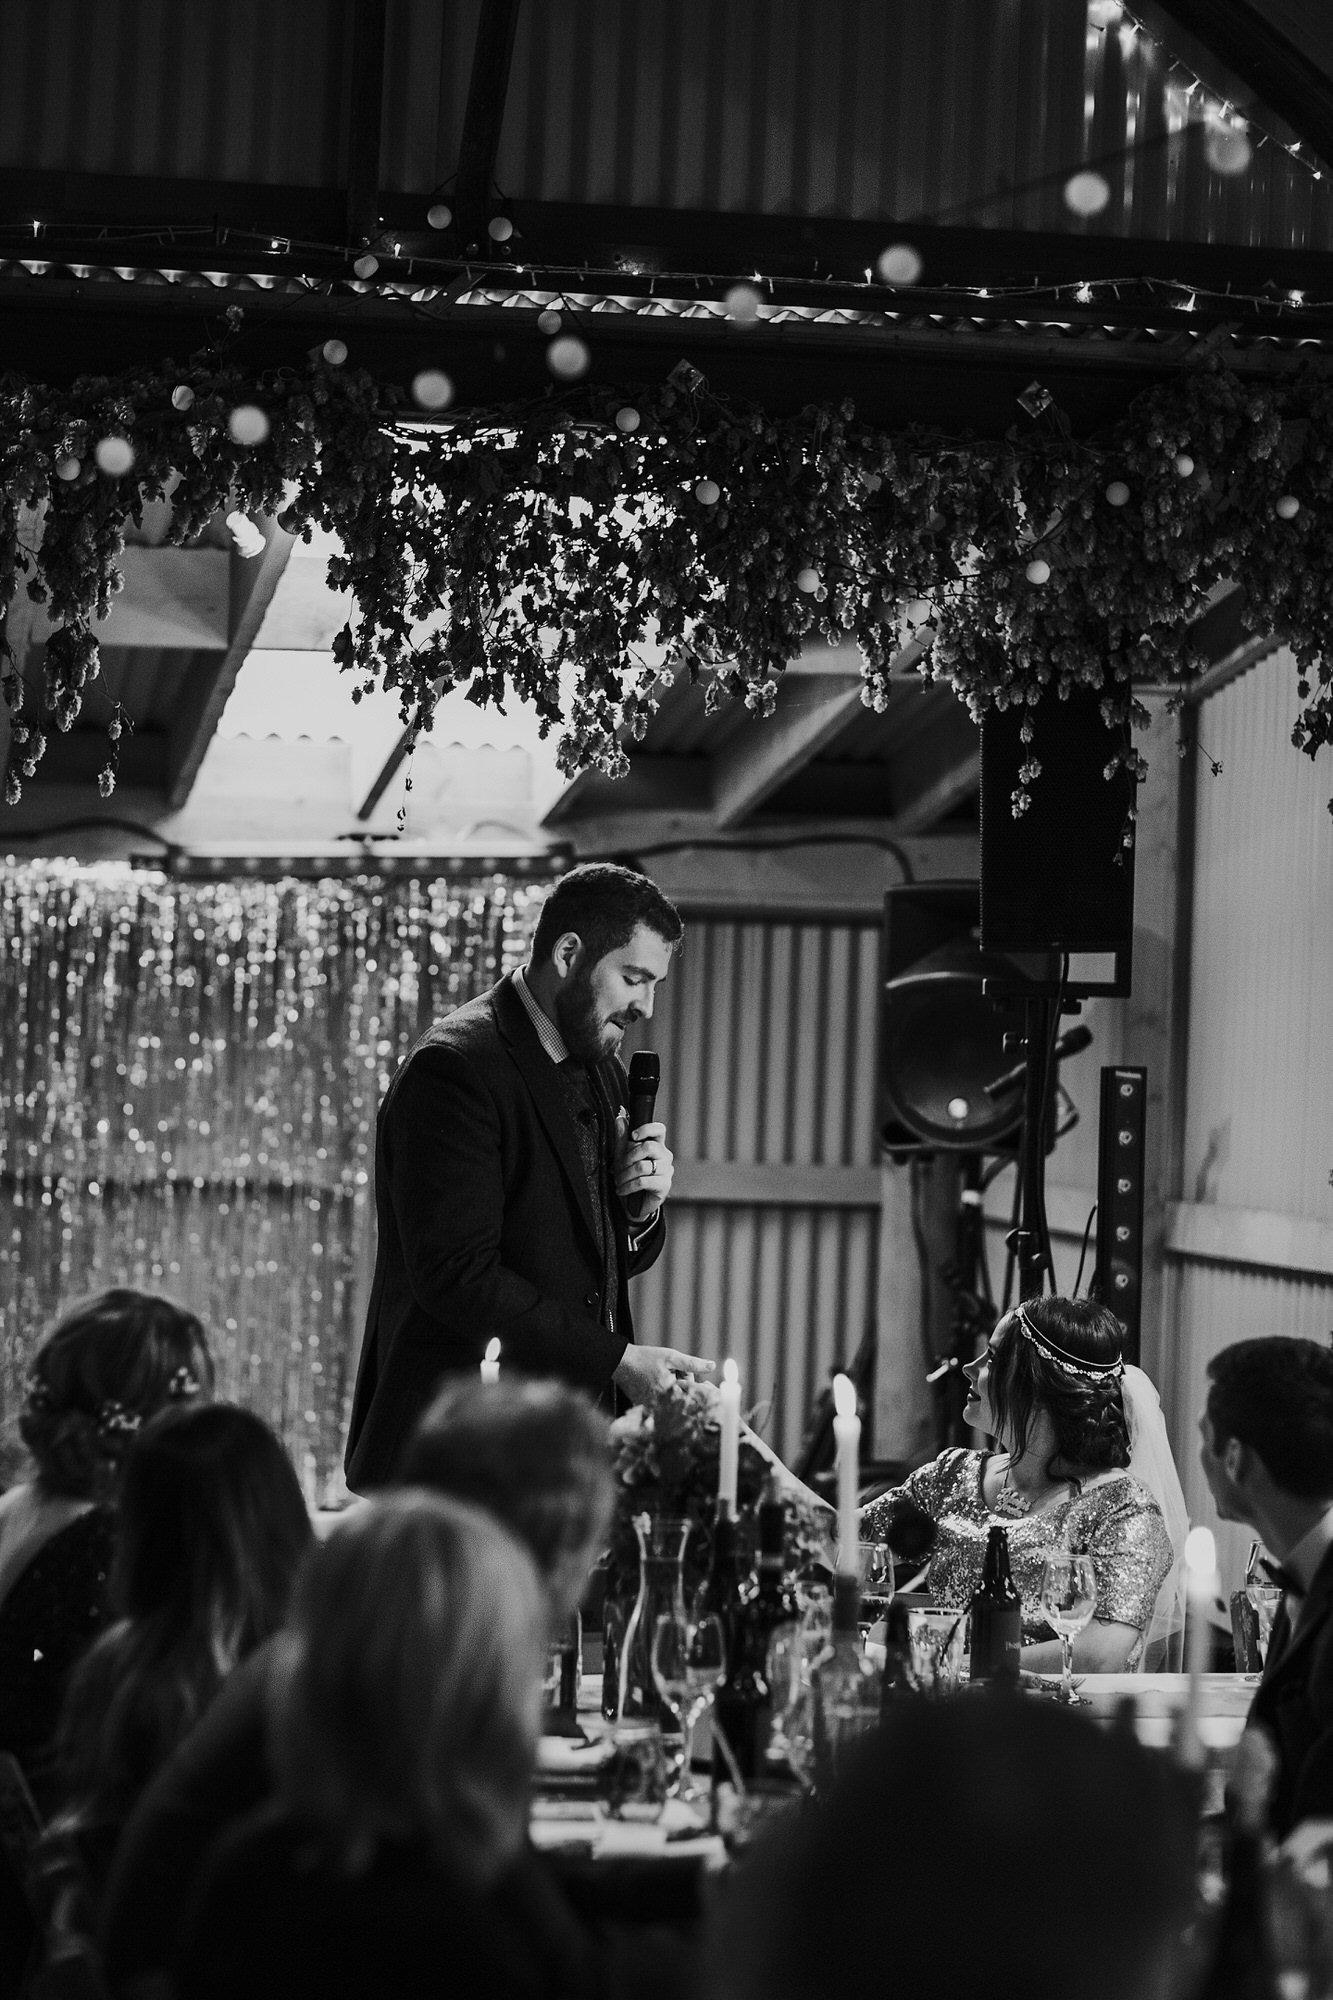 063 TIN SHED KNOCKRAICH FARM WEDDING SPEECHES ALTERNATIVE BRIDE ZOE ALEXANDRA PHOTOGRAPHY